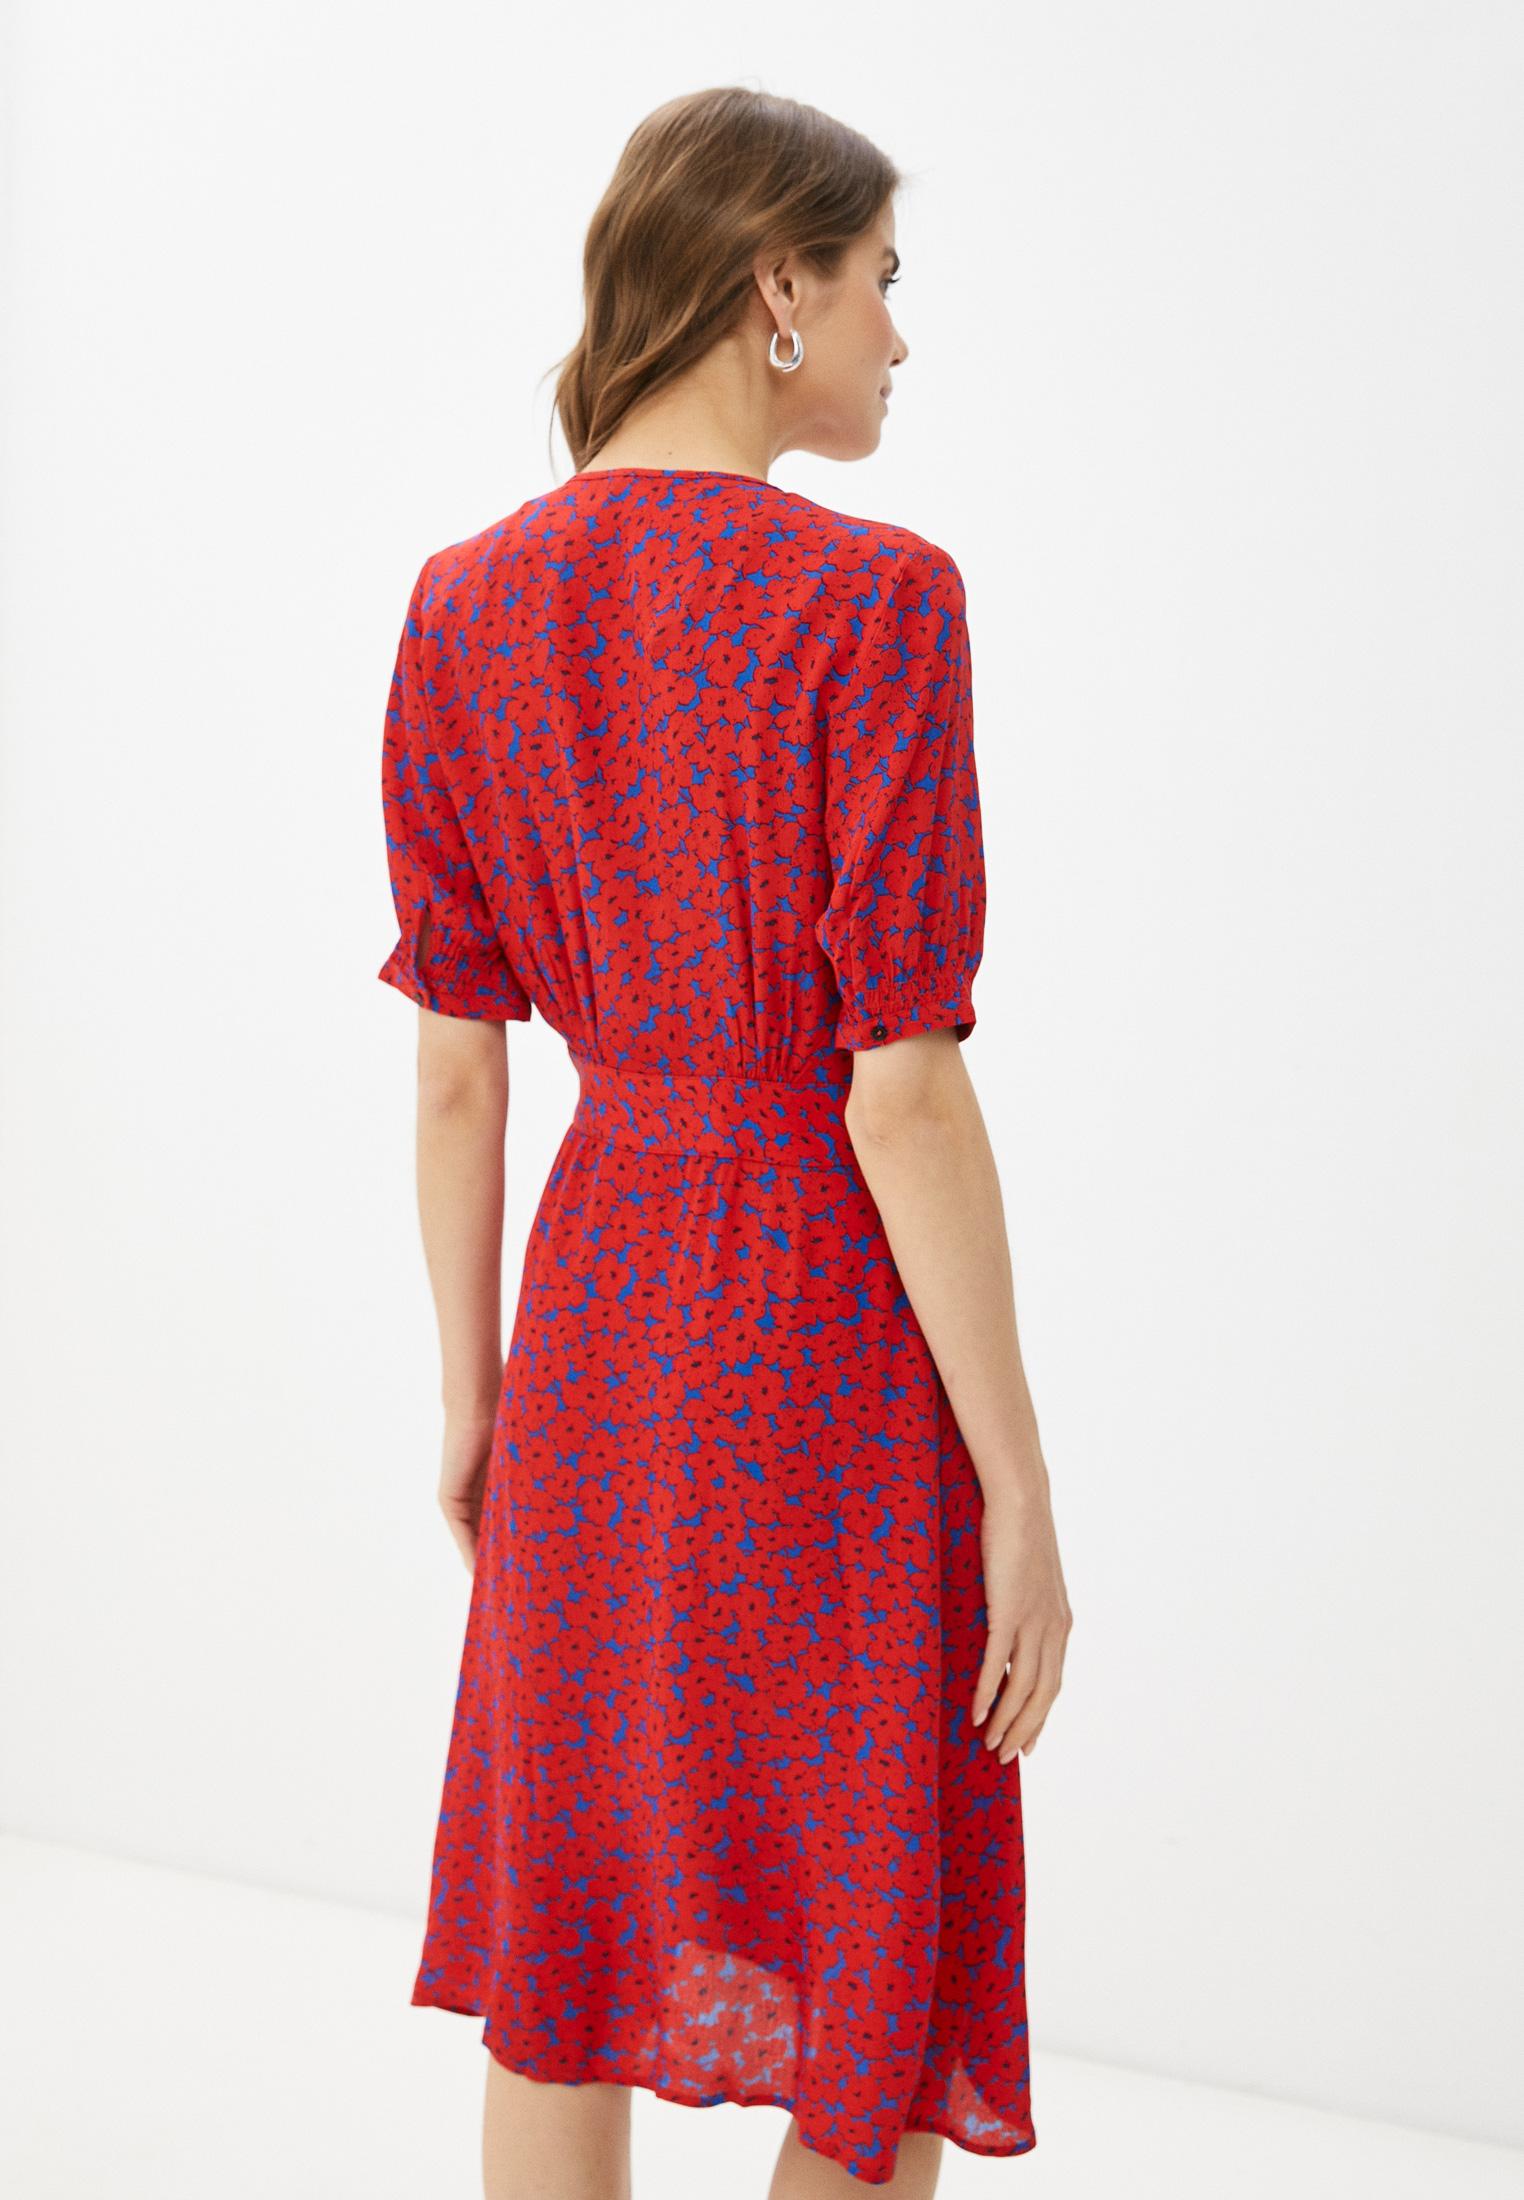 Платье Tommy Hilfiger (Томми Хилфигер) WW0WW30351: изображение 3